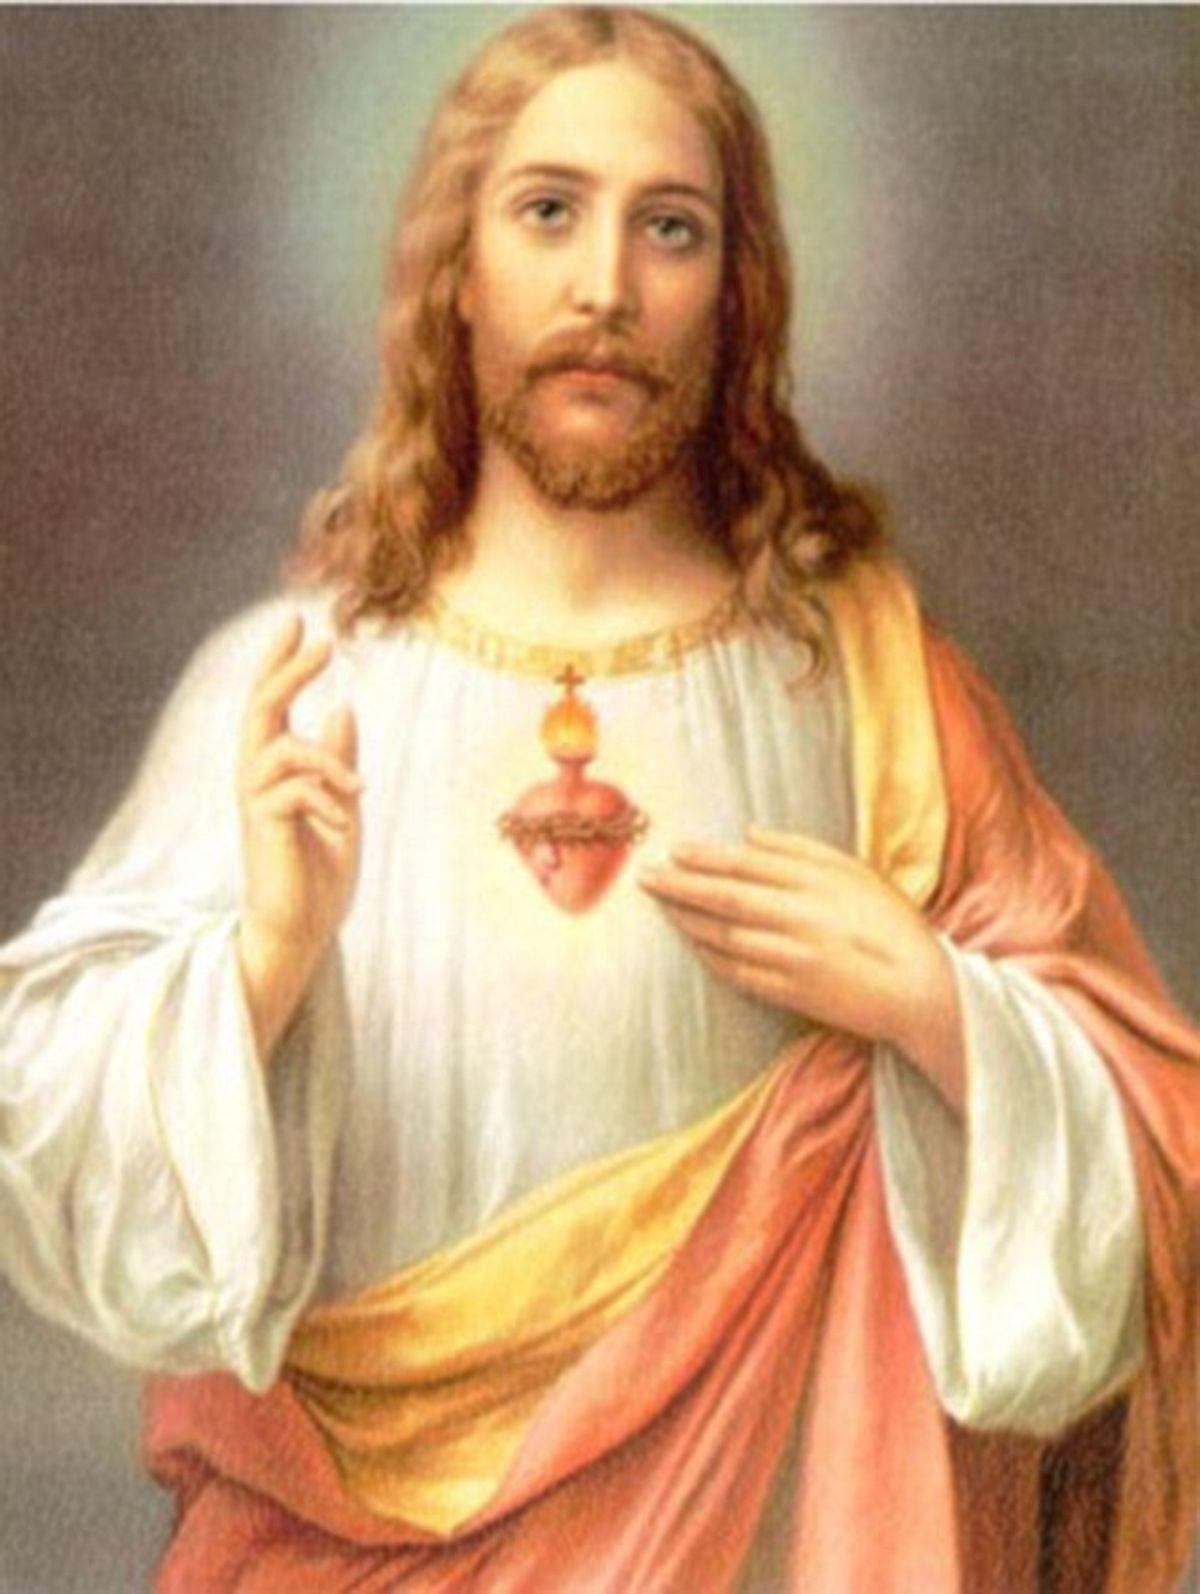 Does White Jesus Hate My Black Skin?